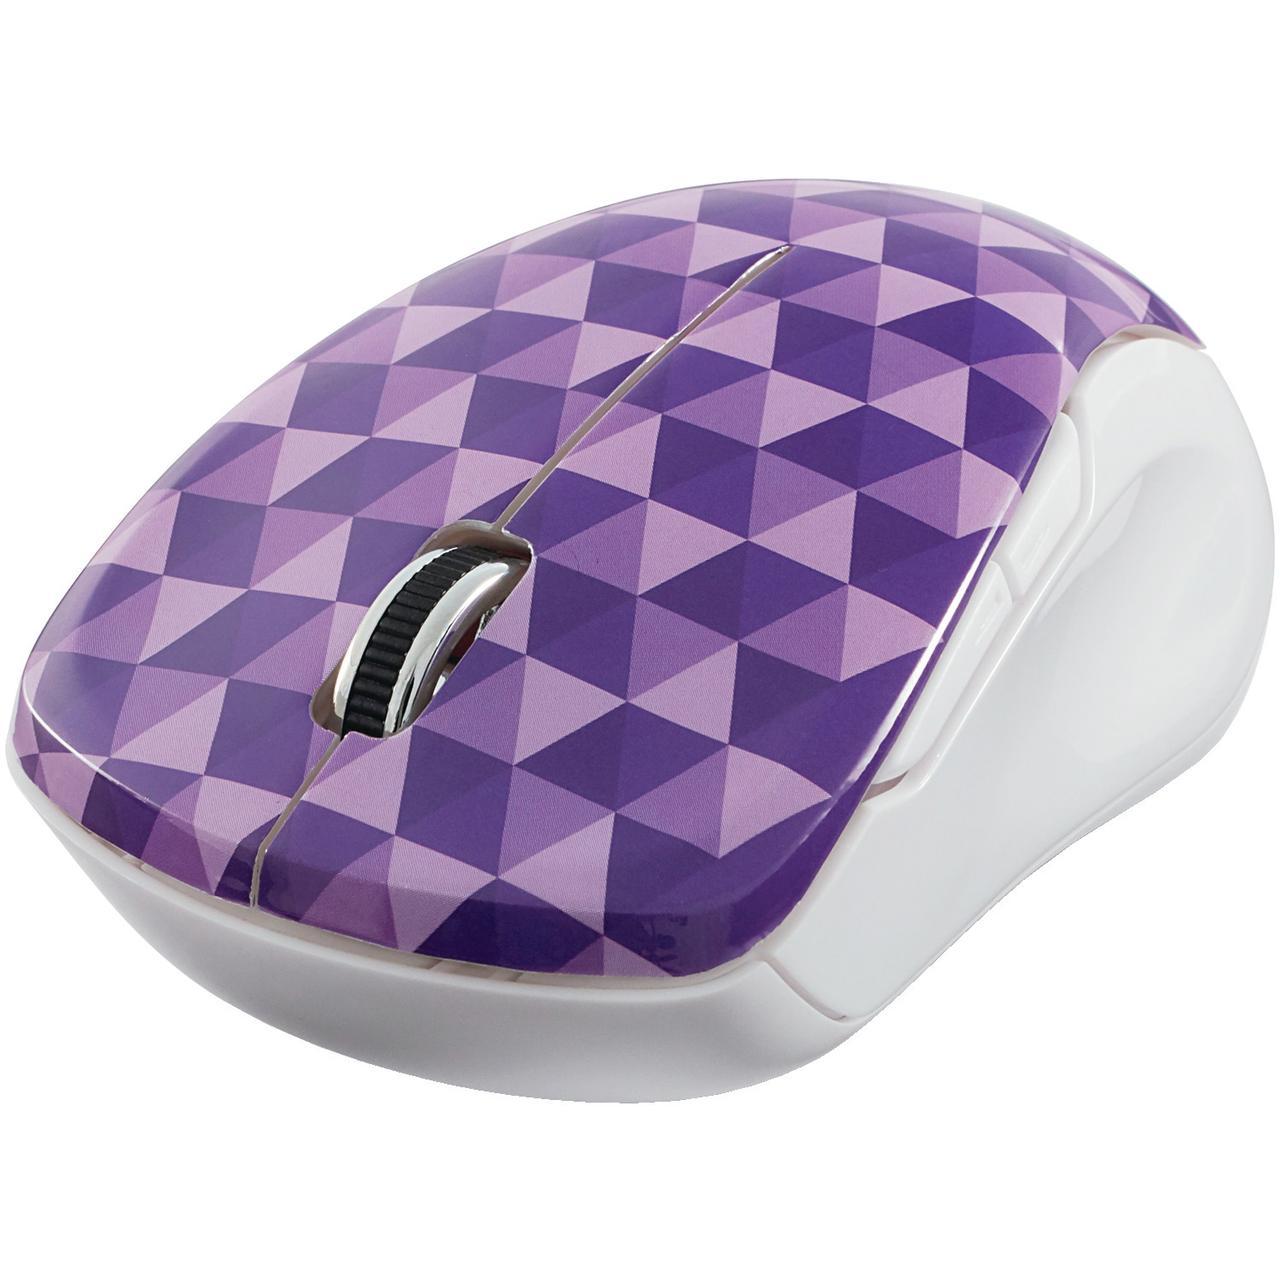 Verbatim 99746 Wireless Notebook Multi-Trac Blue LED Mouse (Diamond Pattern; Purple)